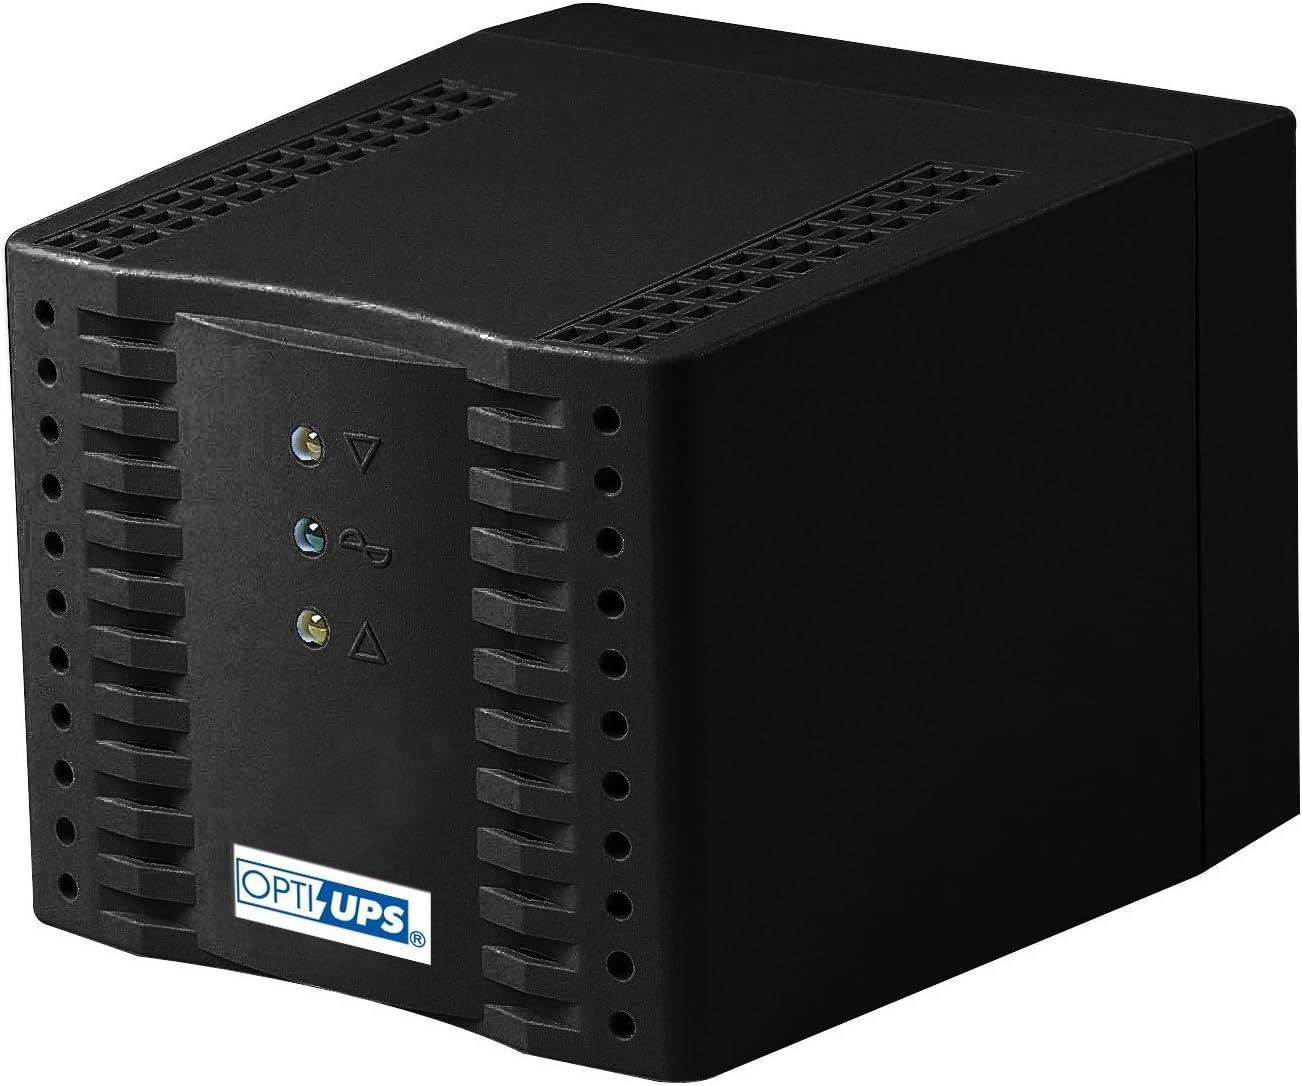 Opti-UPS Stabilizer Series Voltage Regulator